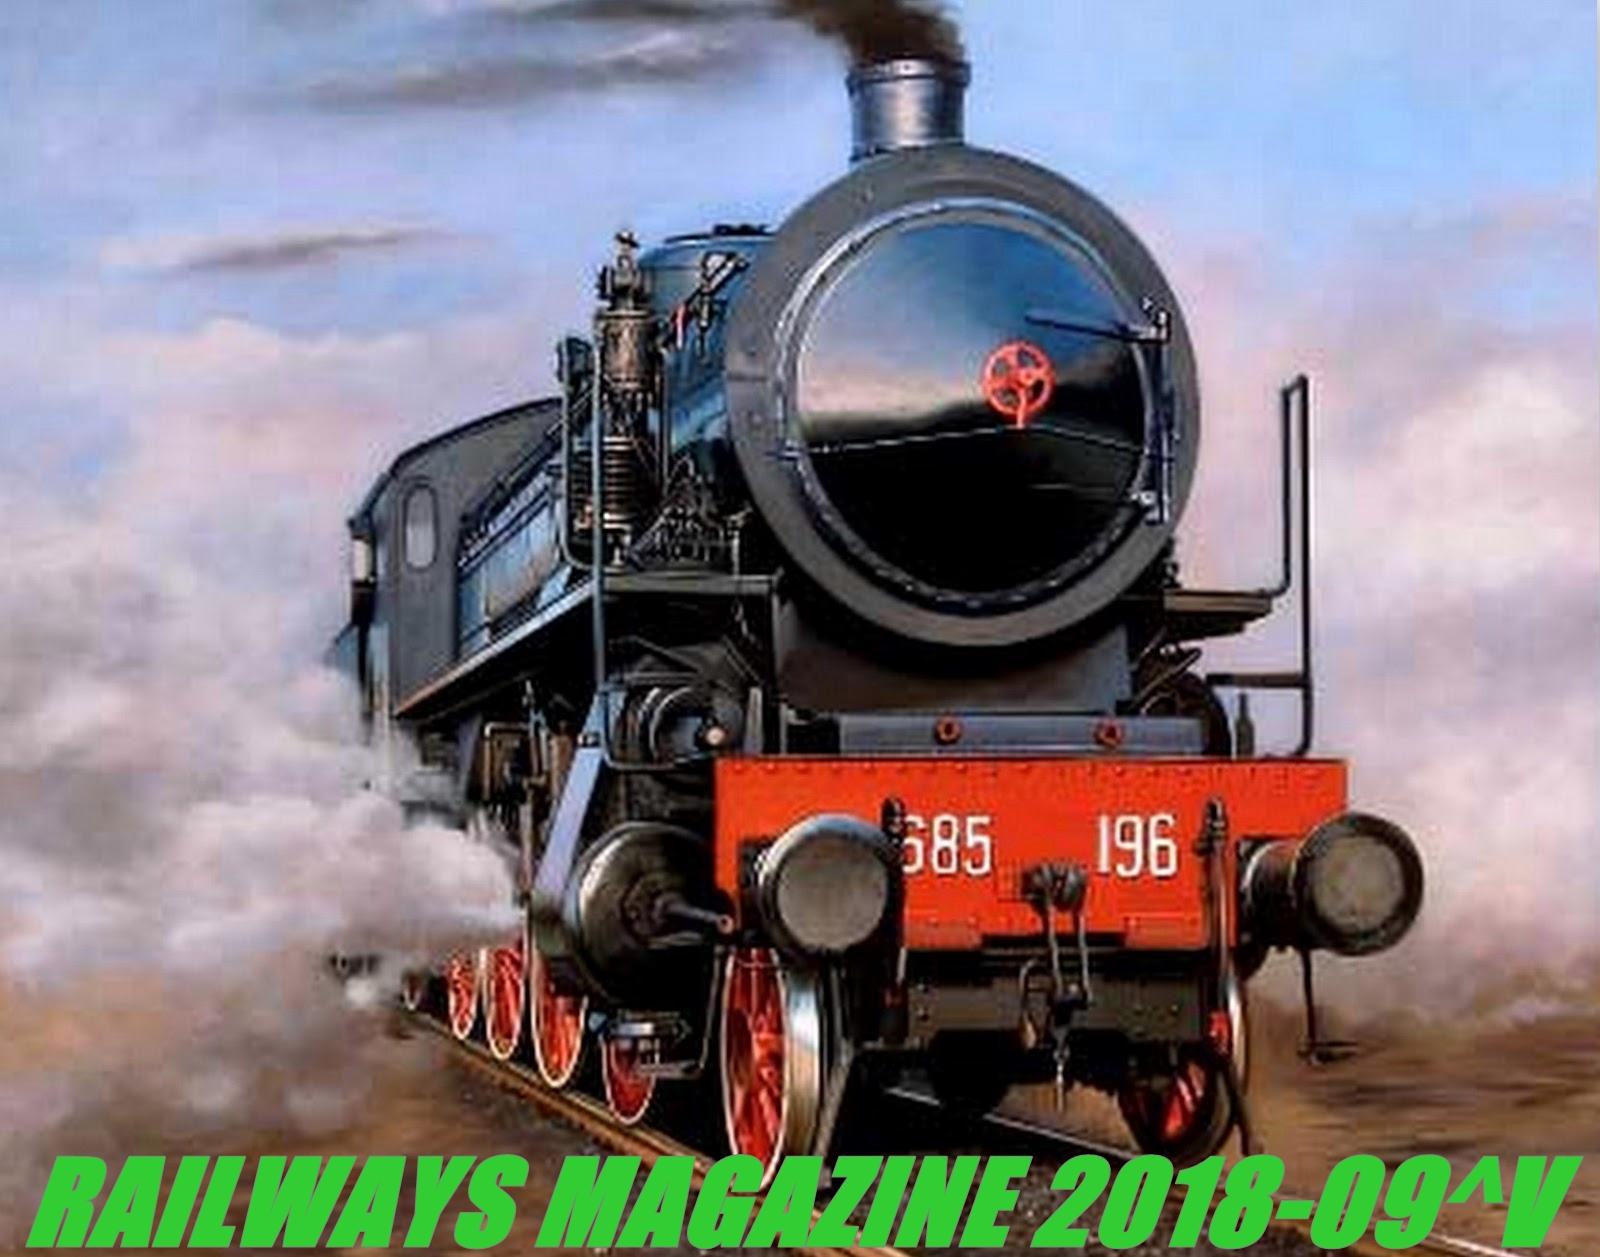 Railways Magazine 2018-09